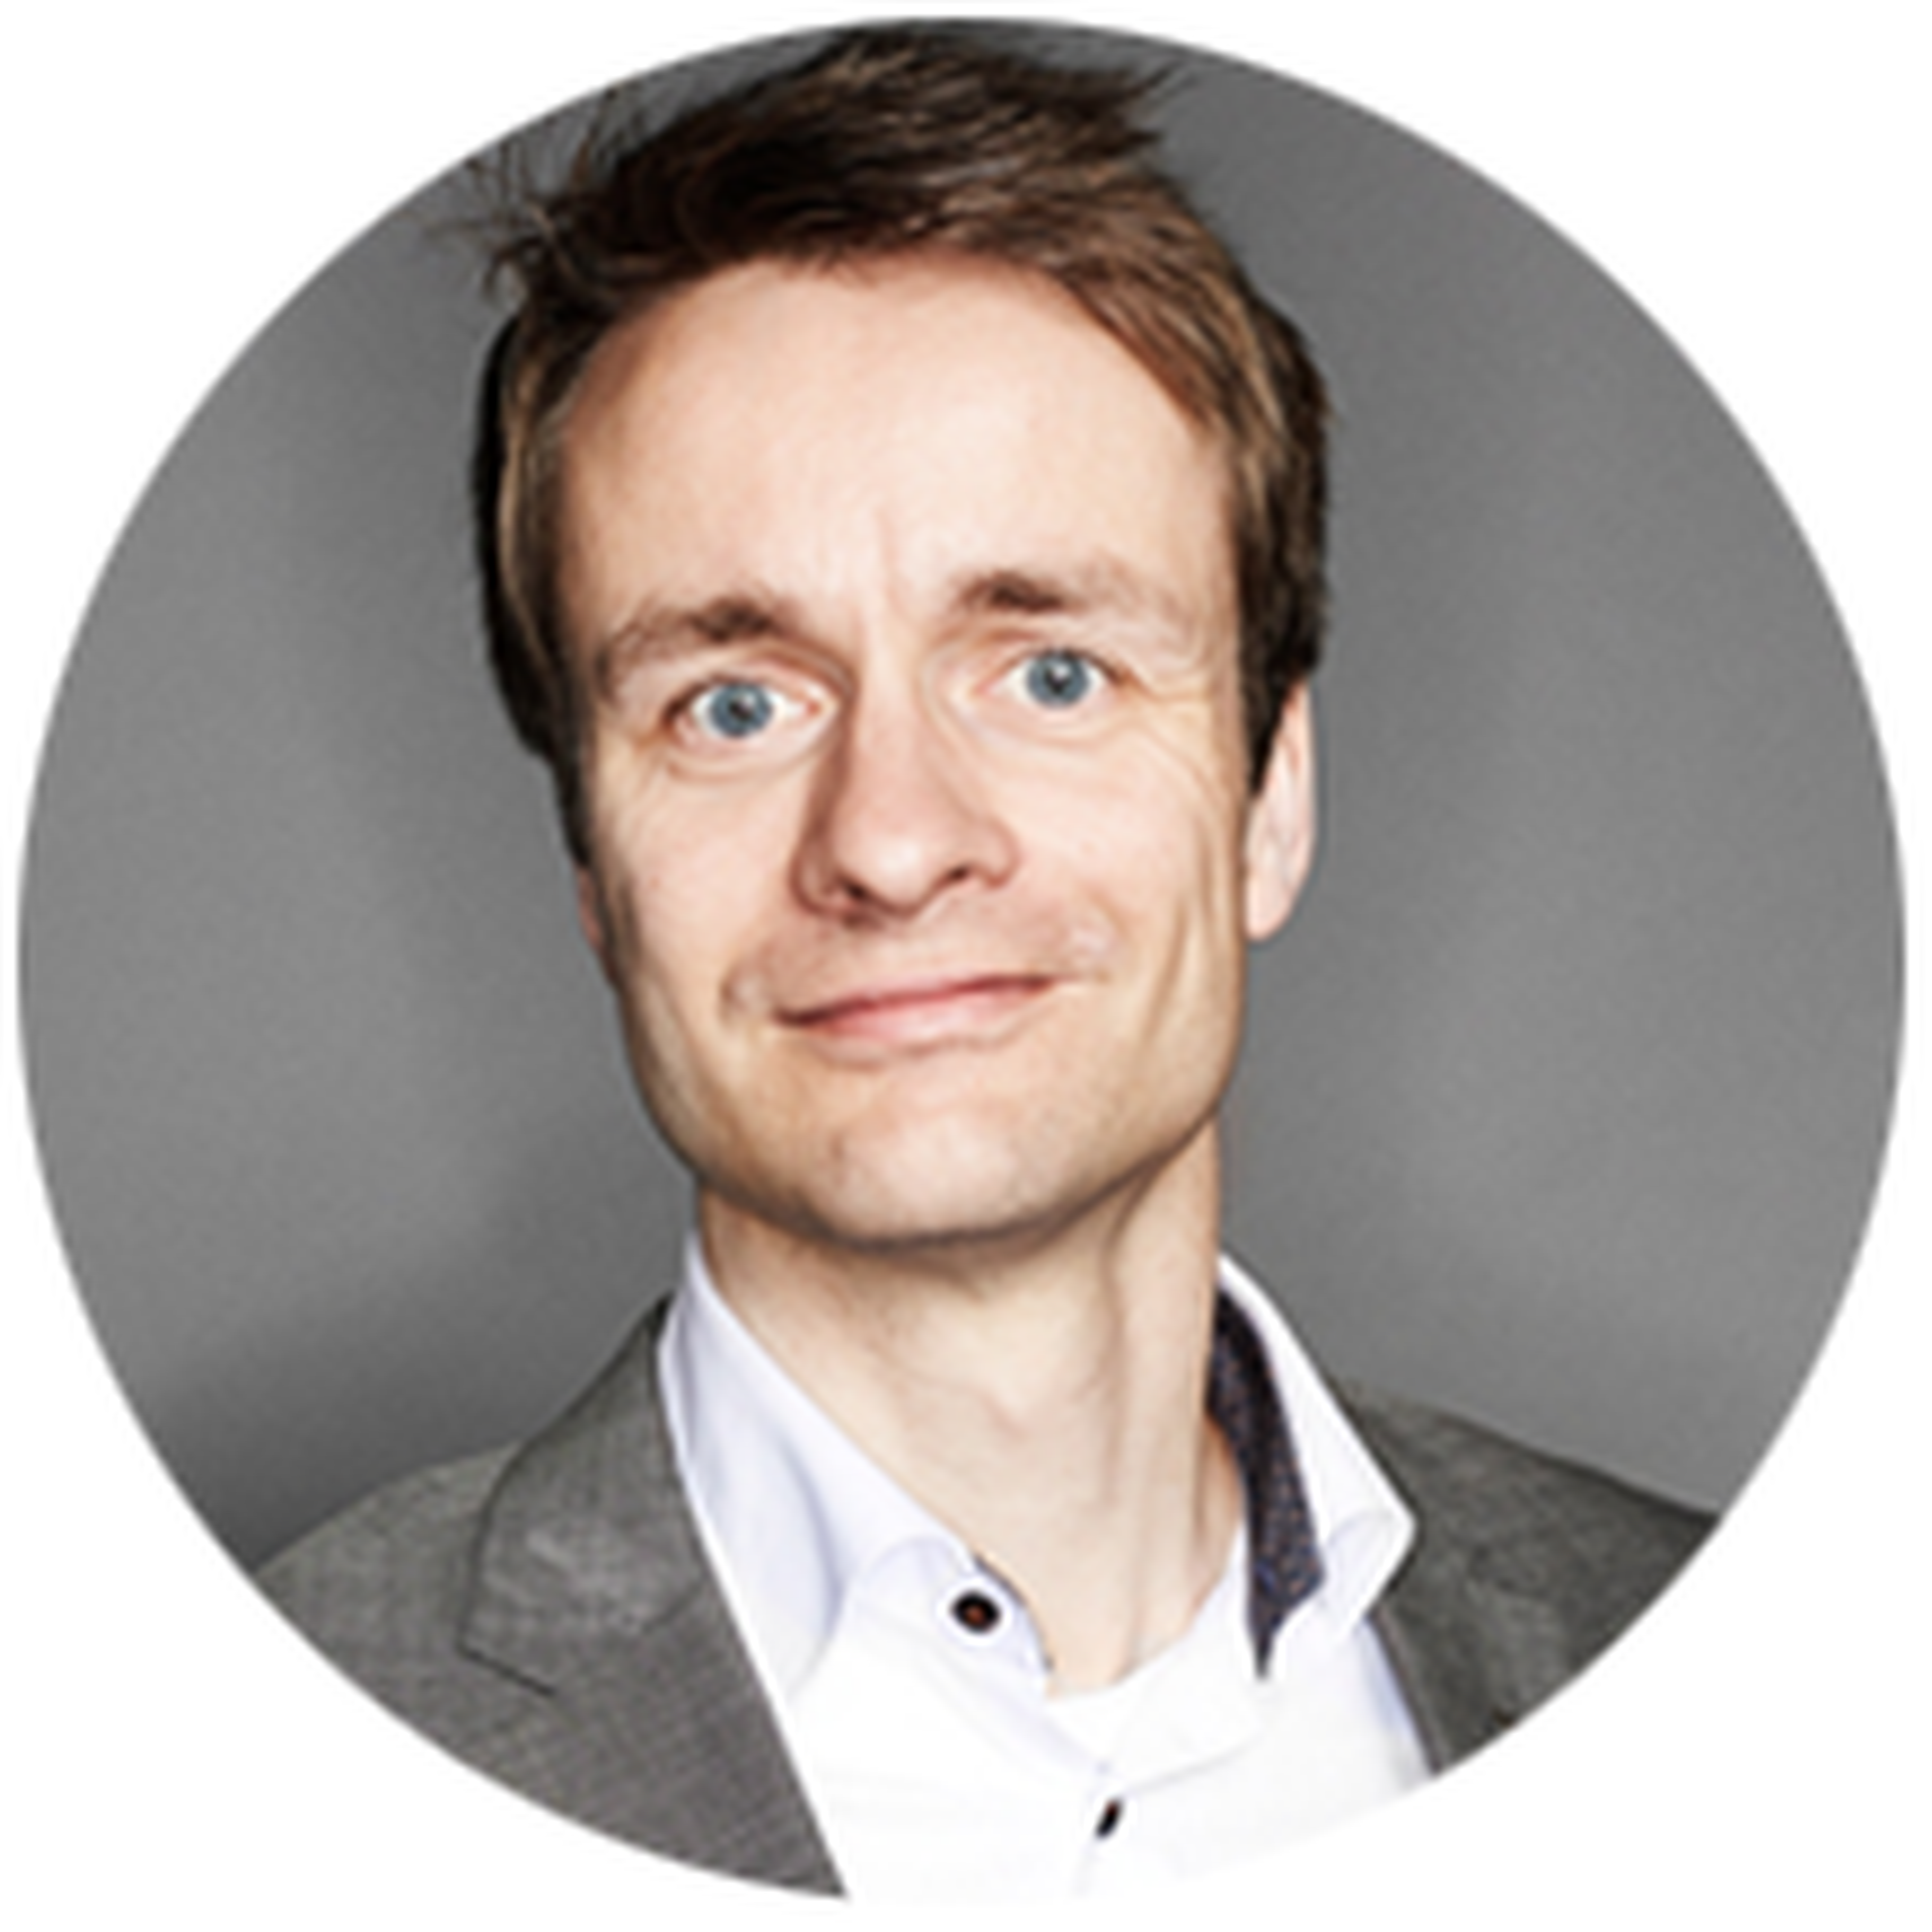 Kristian Kolind